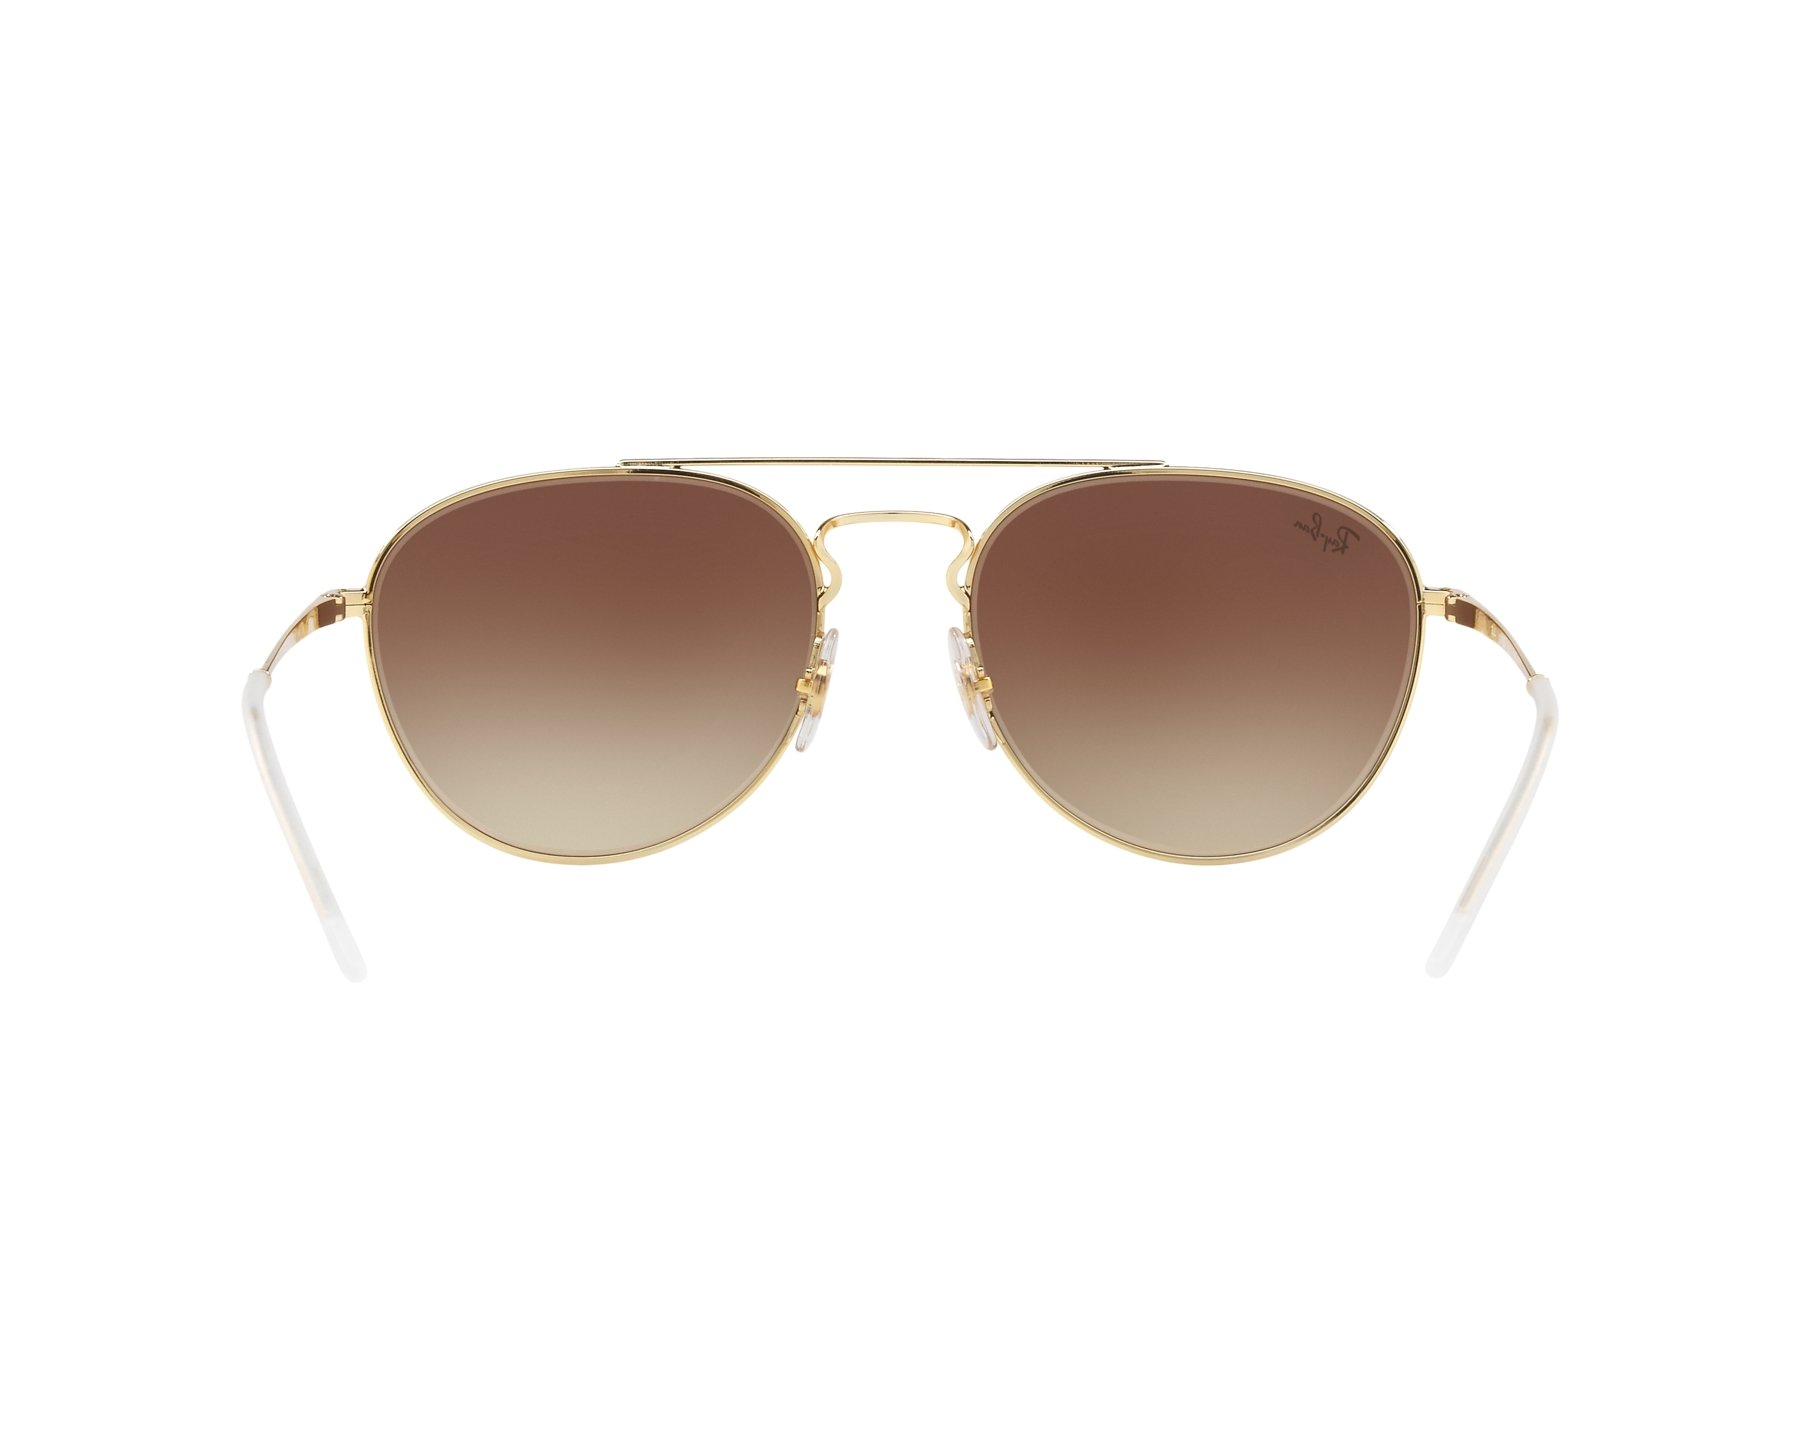 c663de133b Sunglasses Ray-Ban RB-3589 905513 55-18 Brown Gold 360 degree view